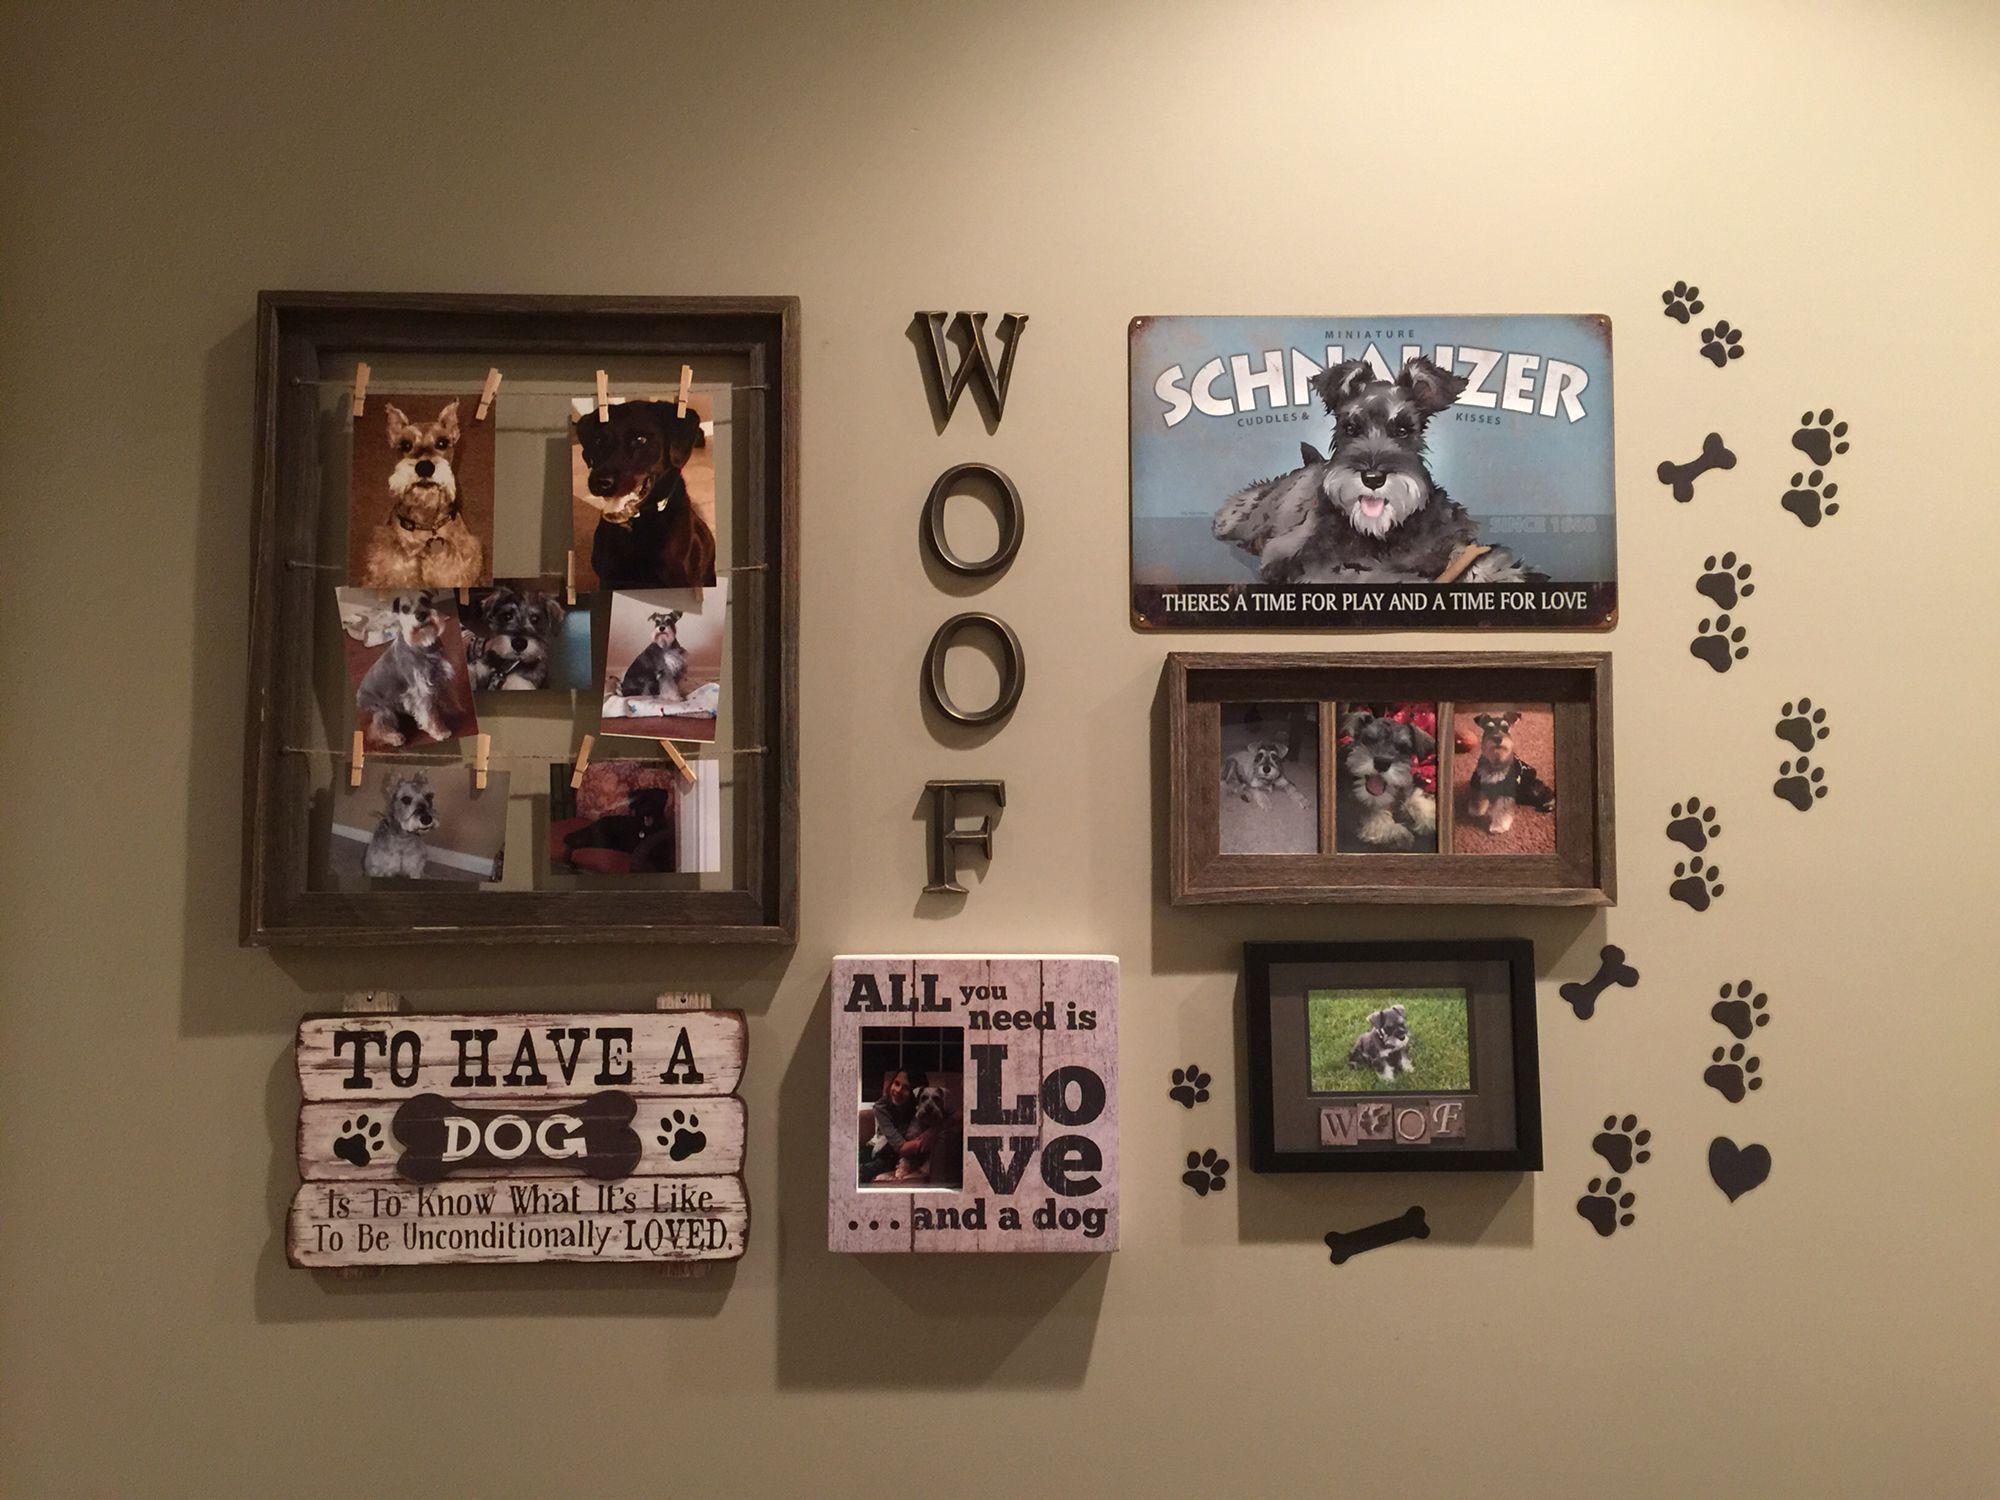 Dog Room Wall, Schnauzers, puppies, Dog Decor